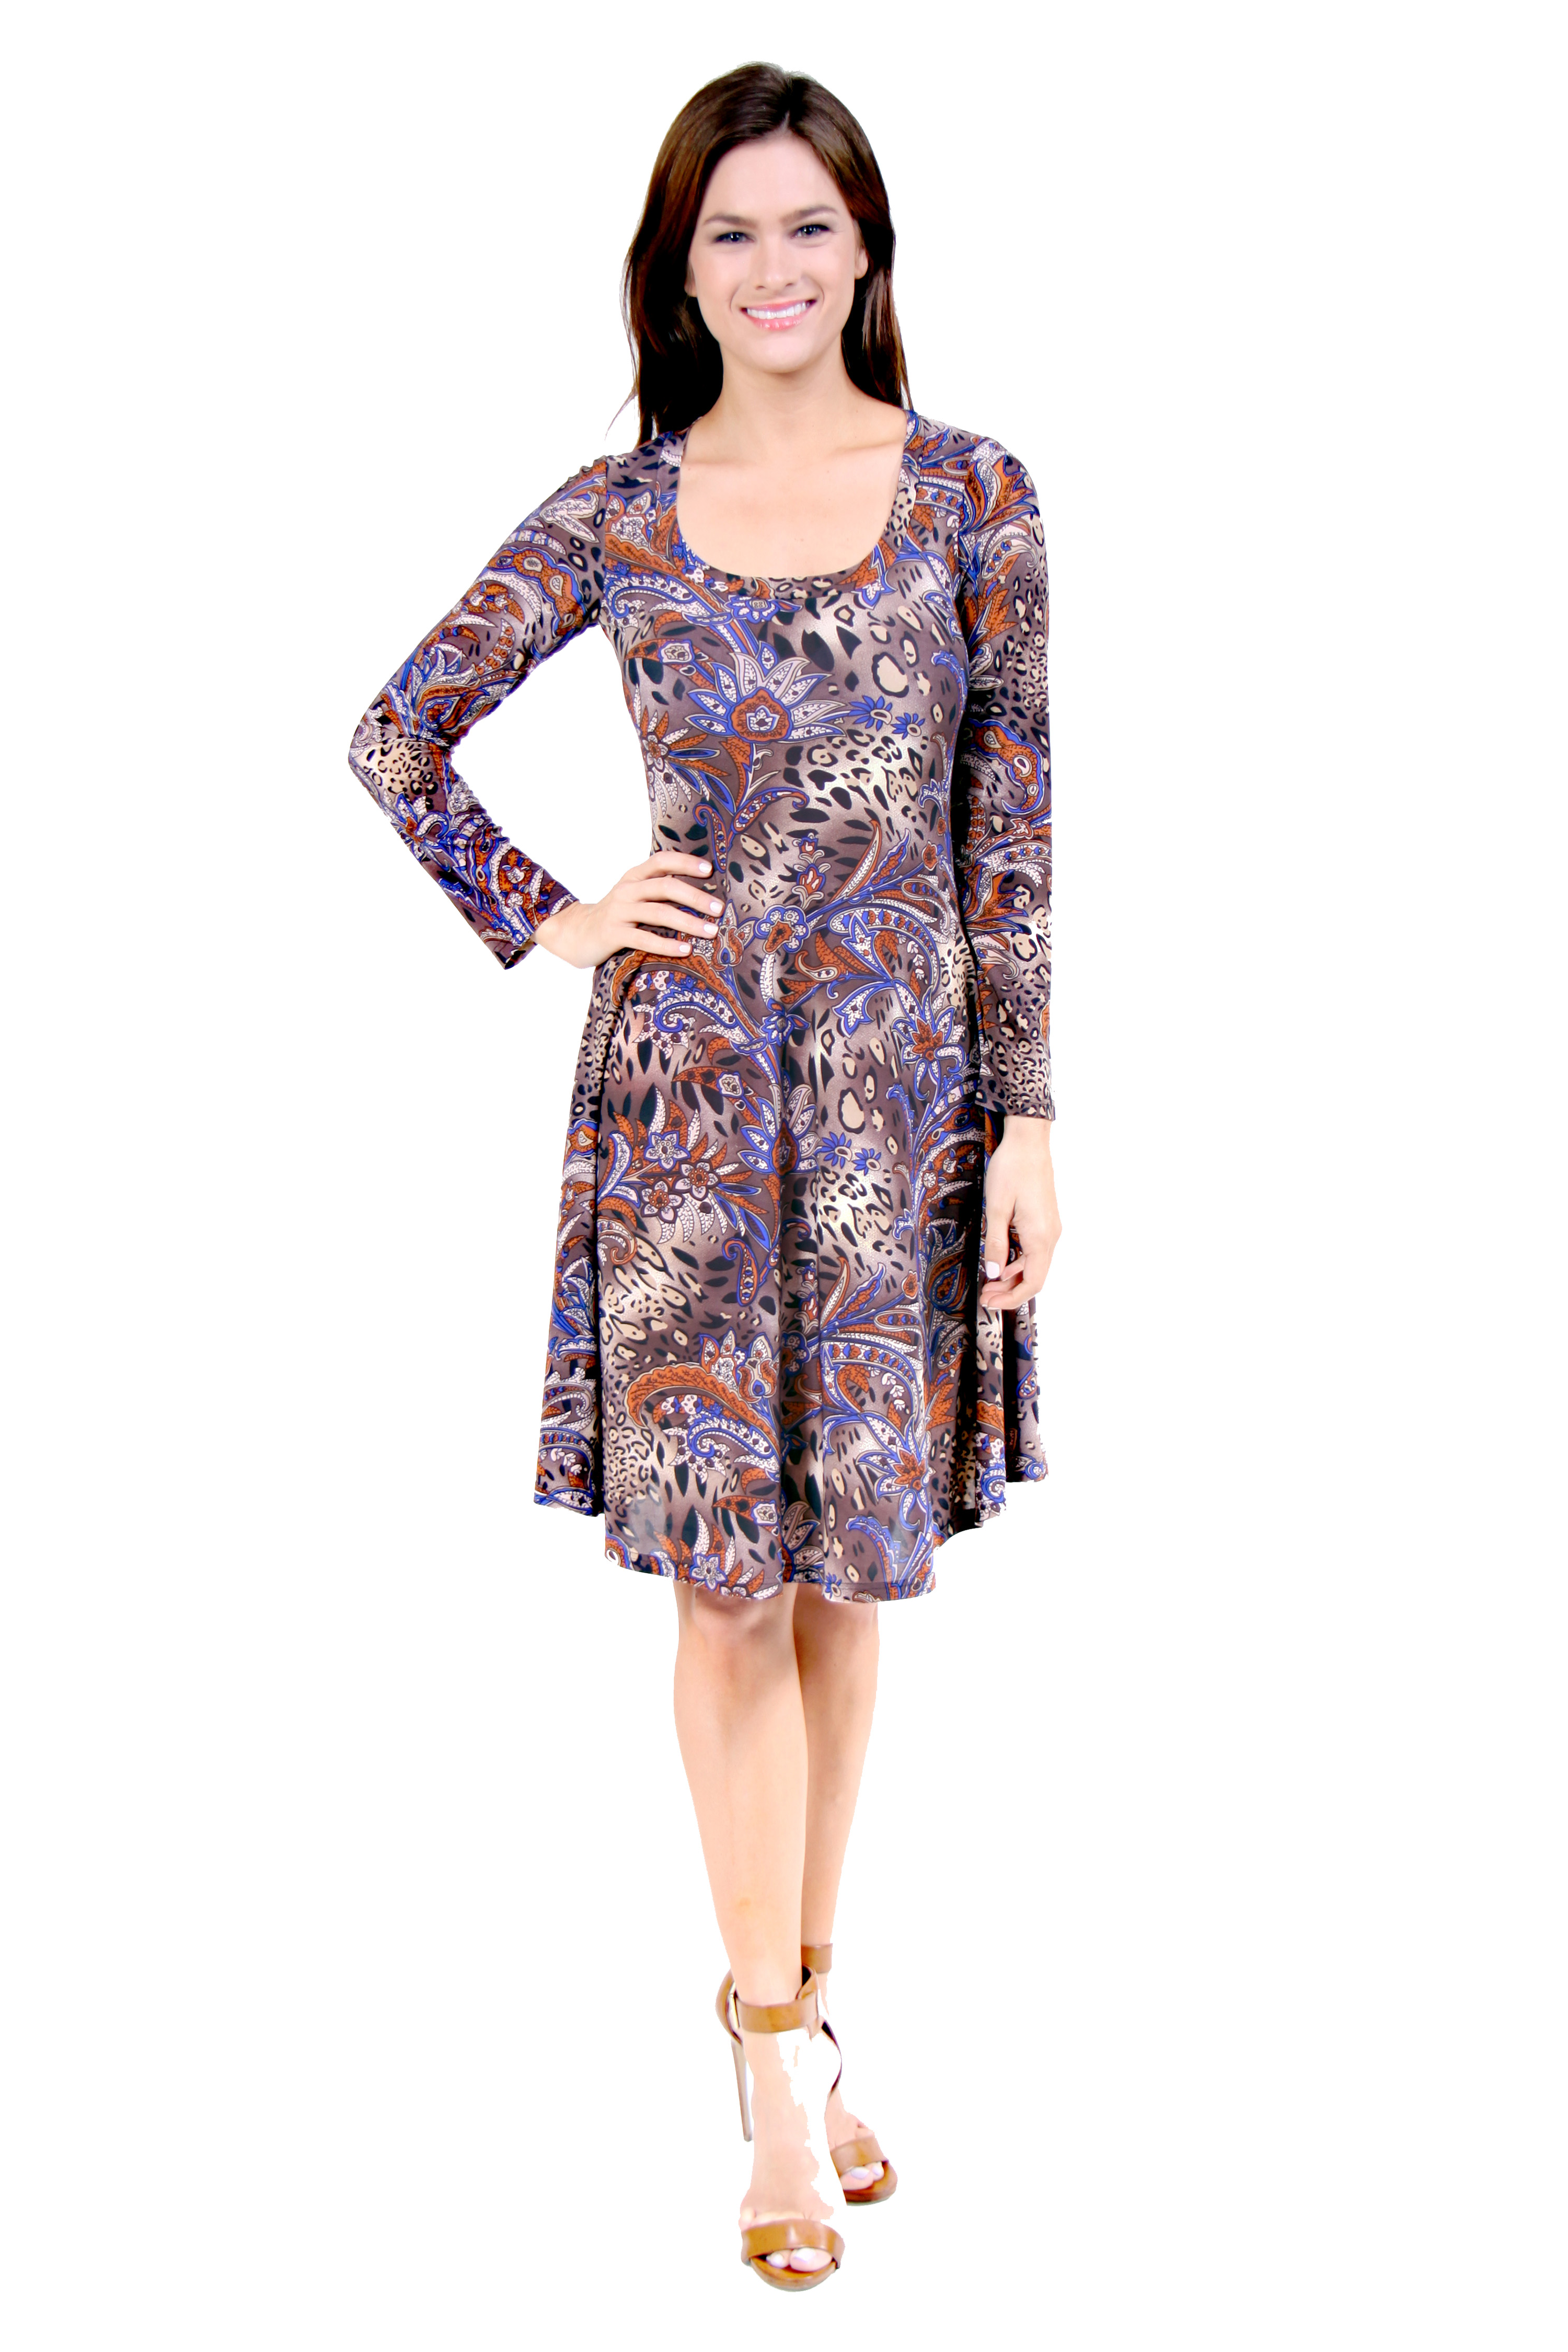 Twenty Four Seven Apparel 24/7 Comfort Apparel Women's Animal Paisley Print Dress